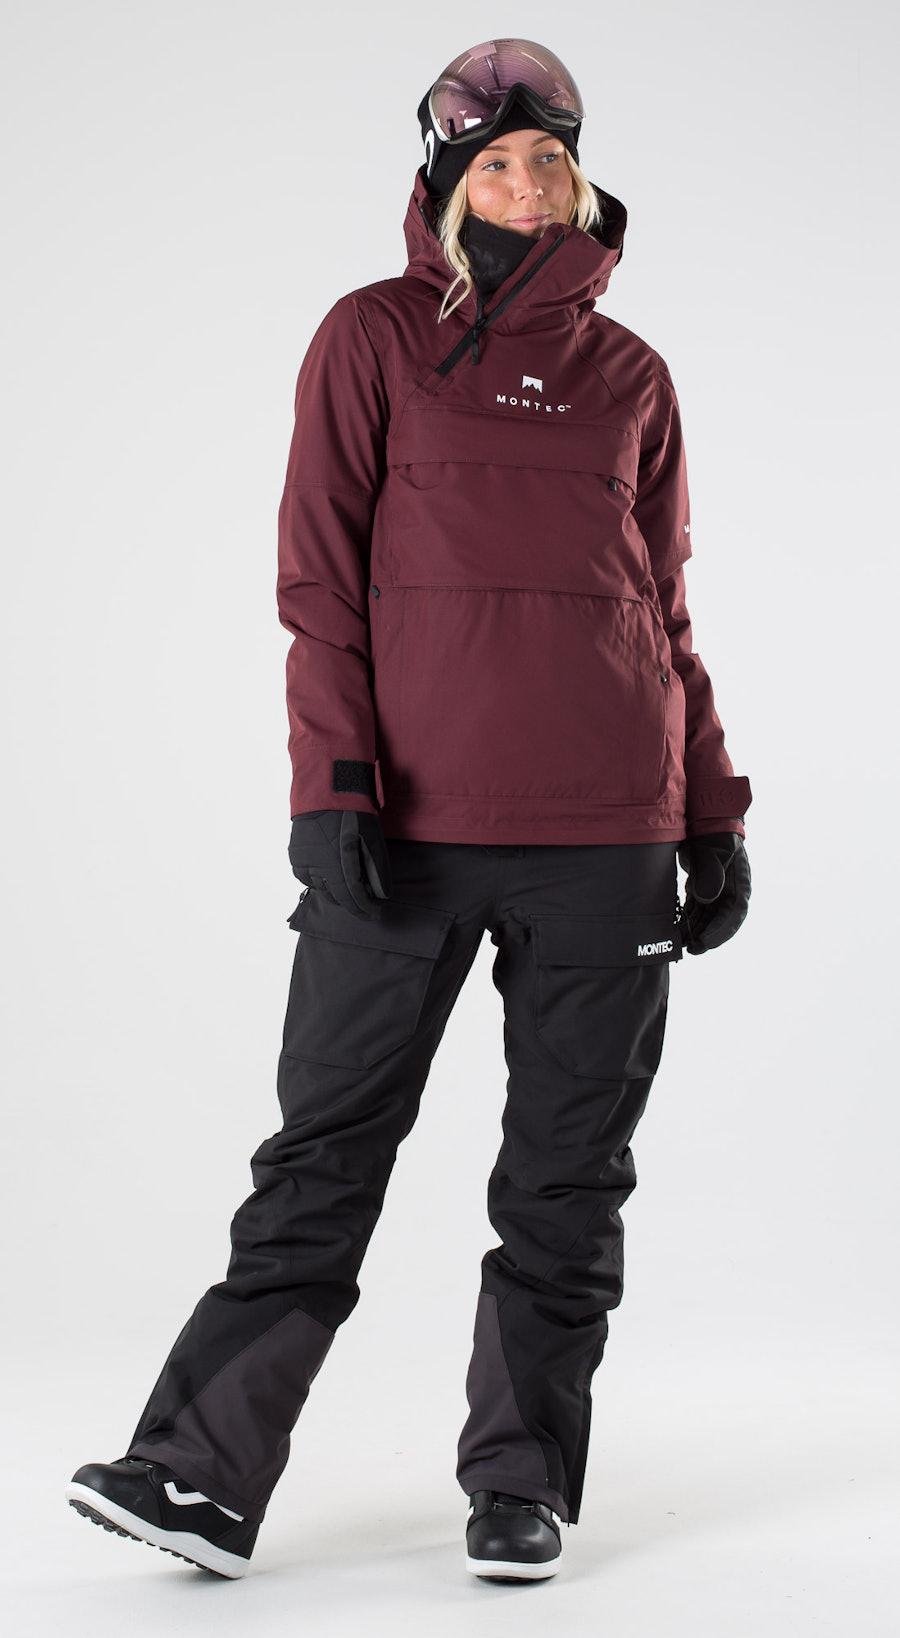 Montec Dune W Burgundy Snowboardkläder Multi